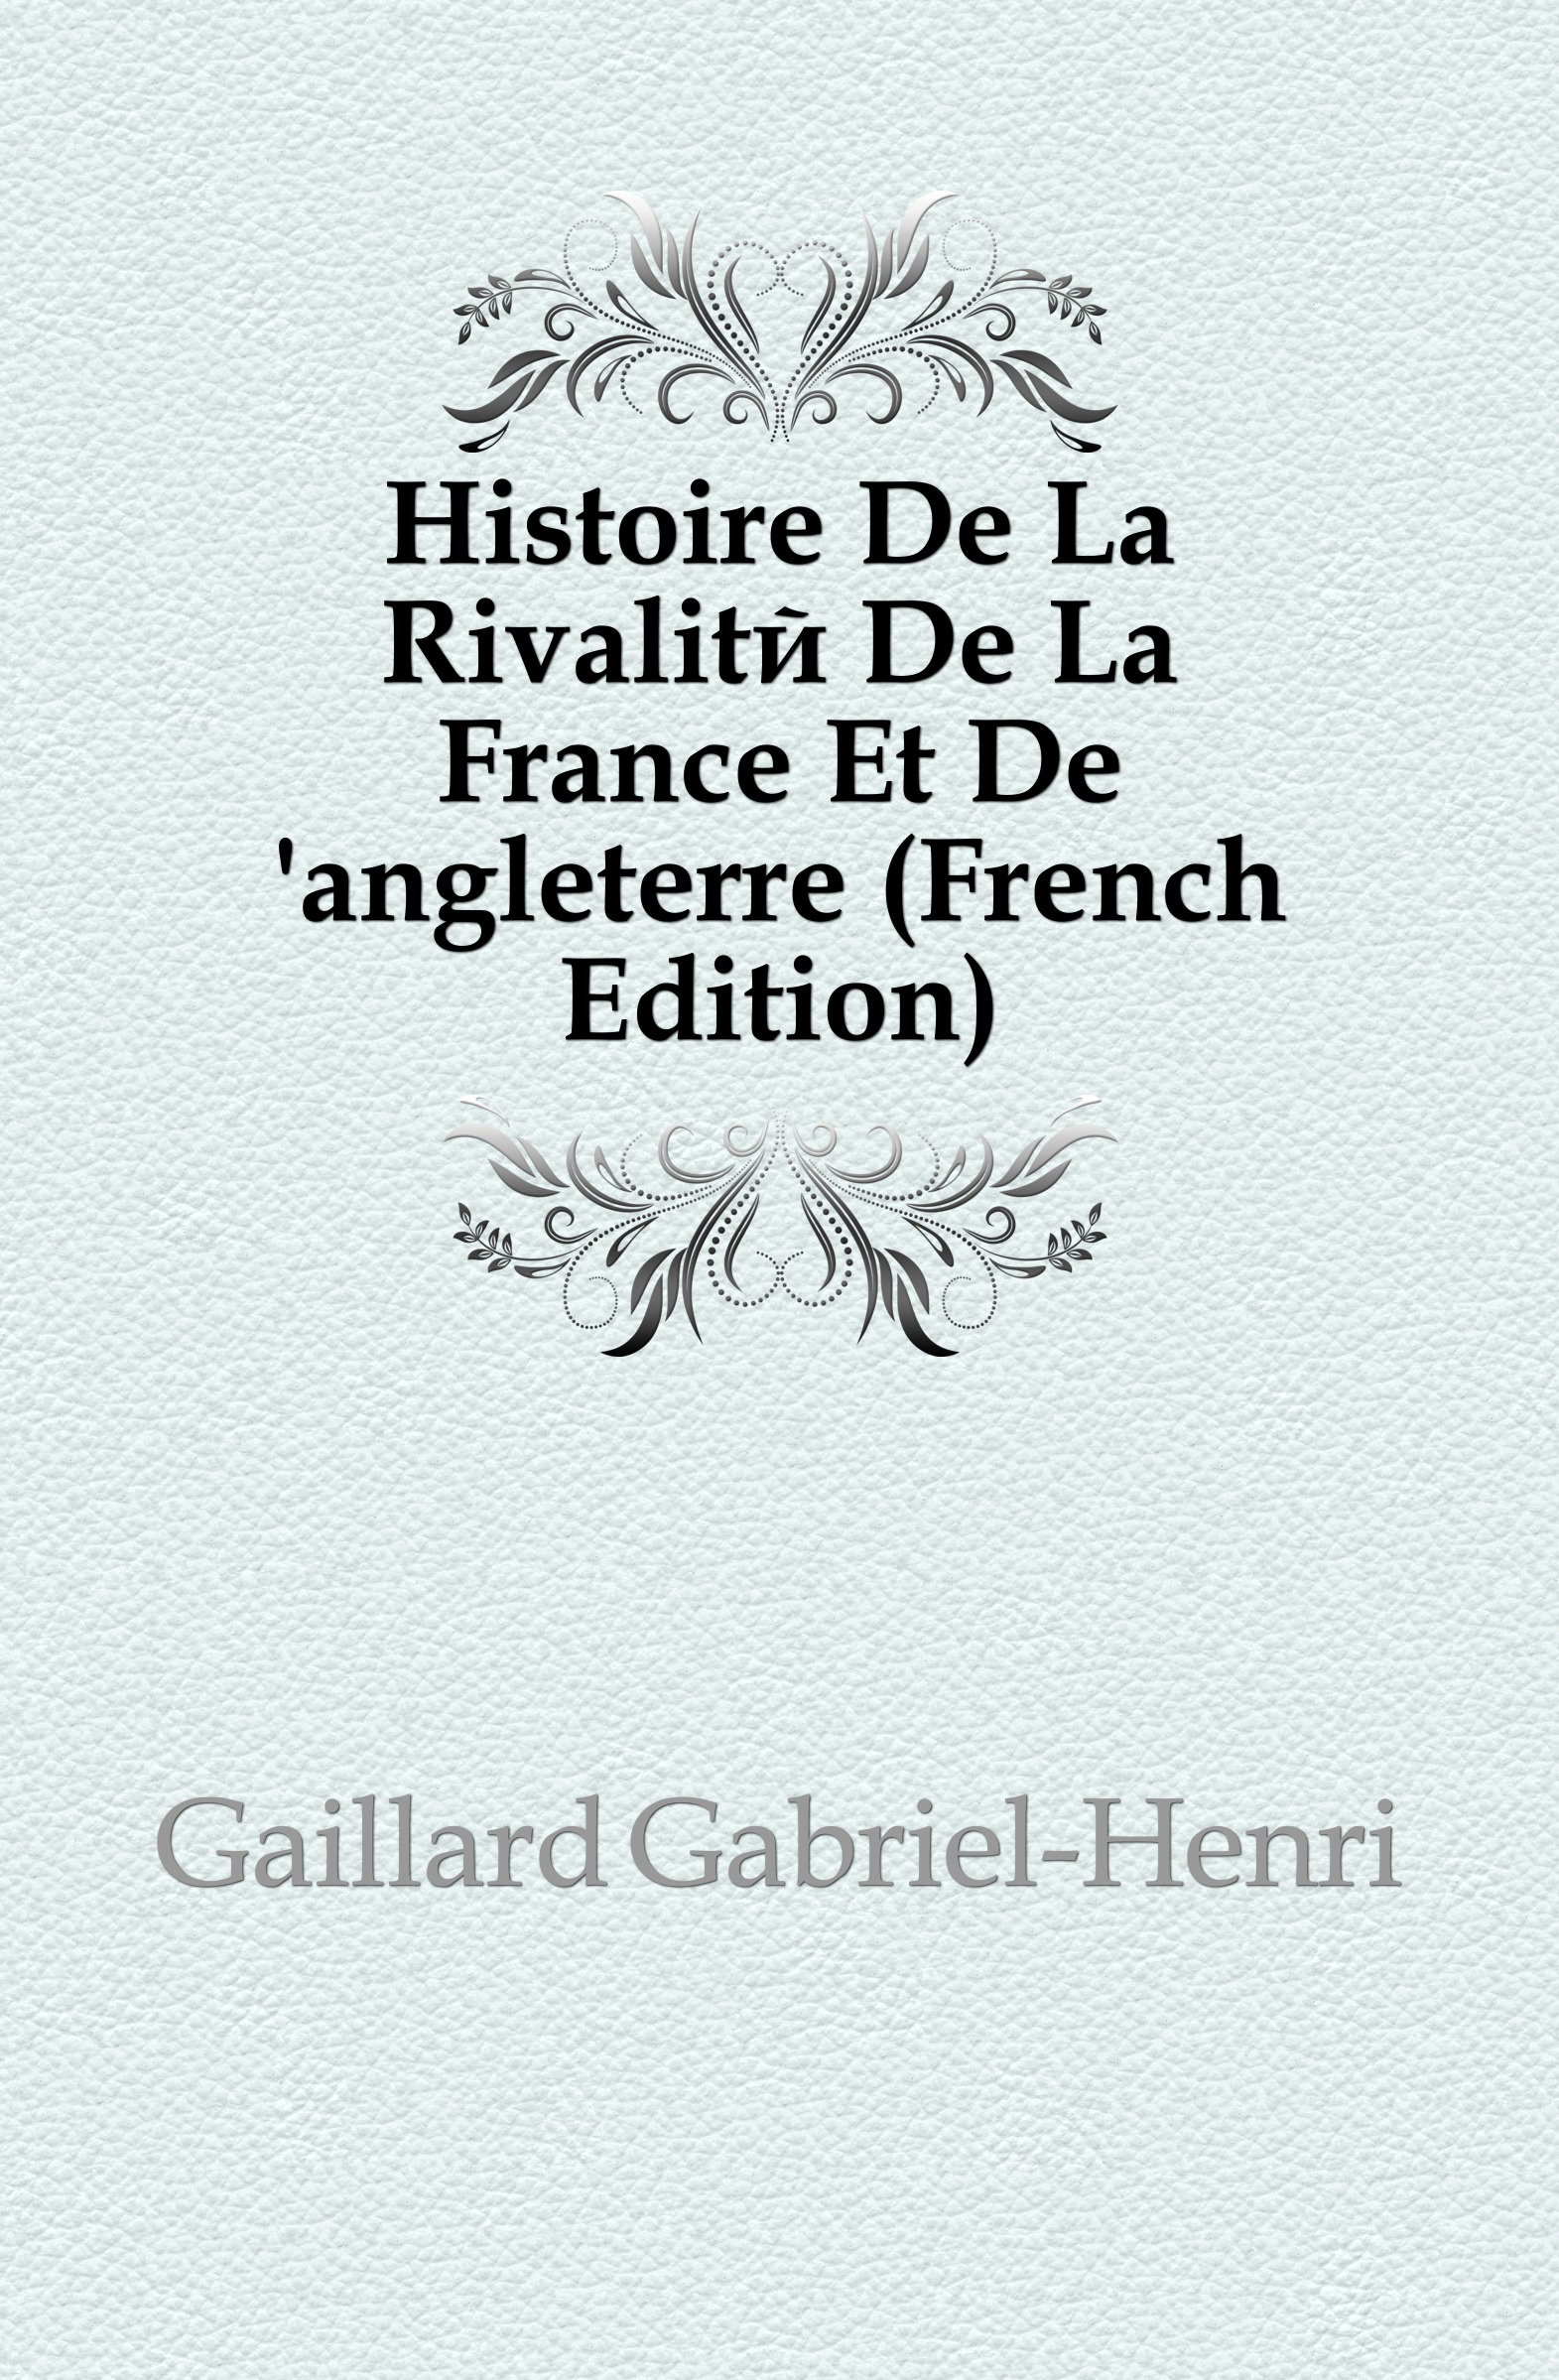 Gaillard Gabriel-Henri Histoire De La Rivalite De La France Et De .angleterre (French Edition)